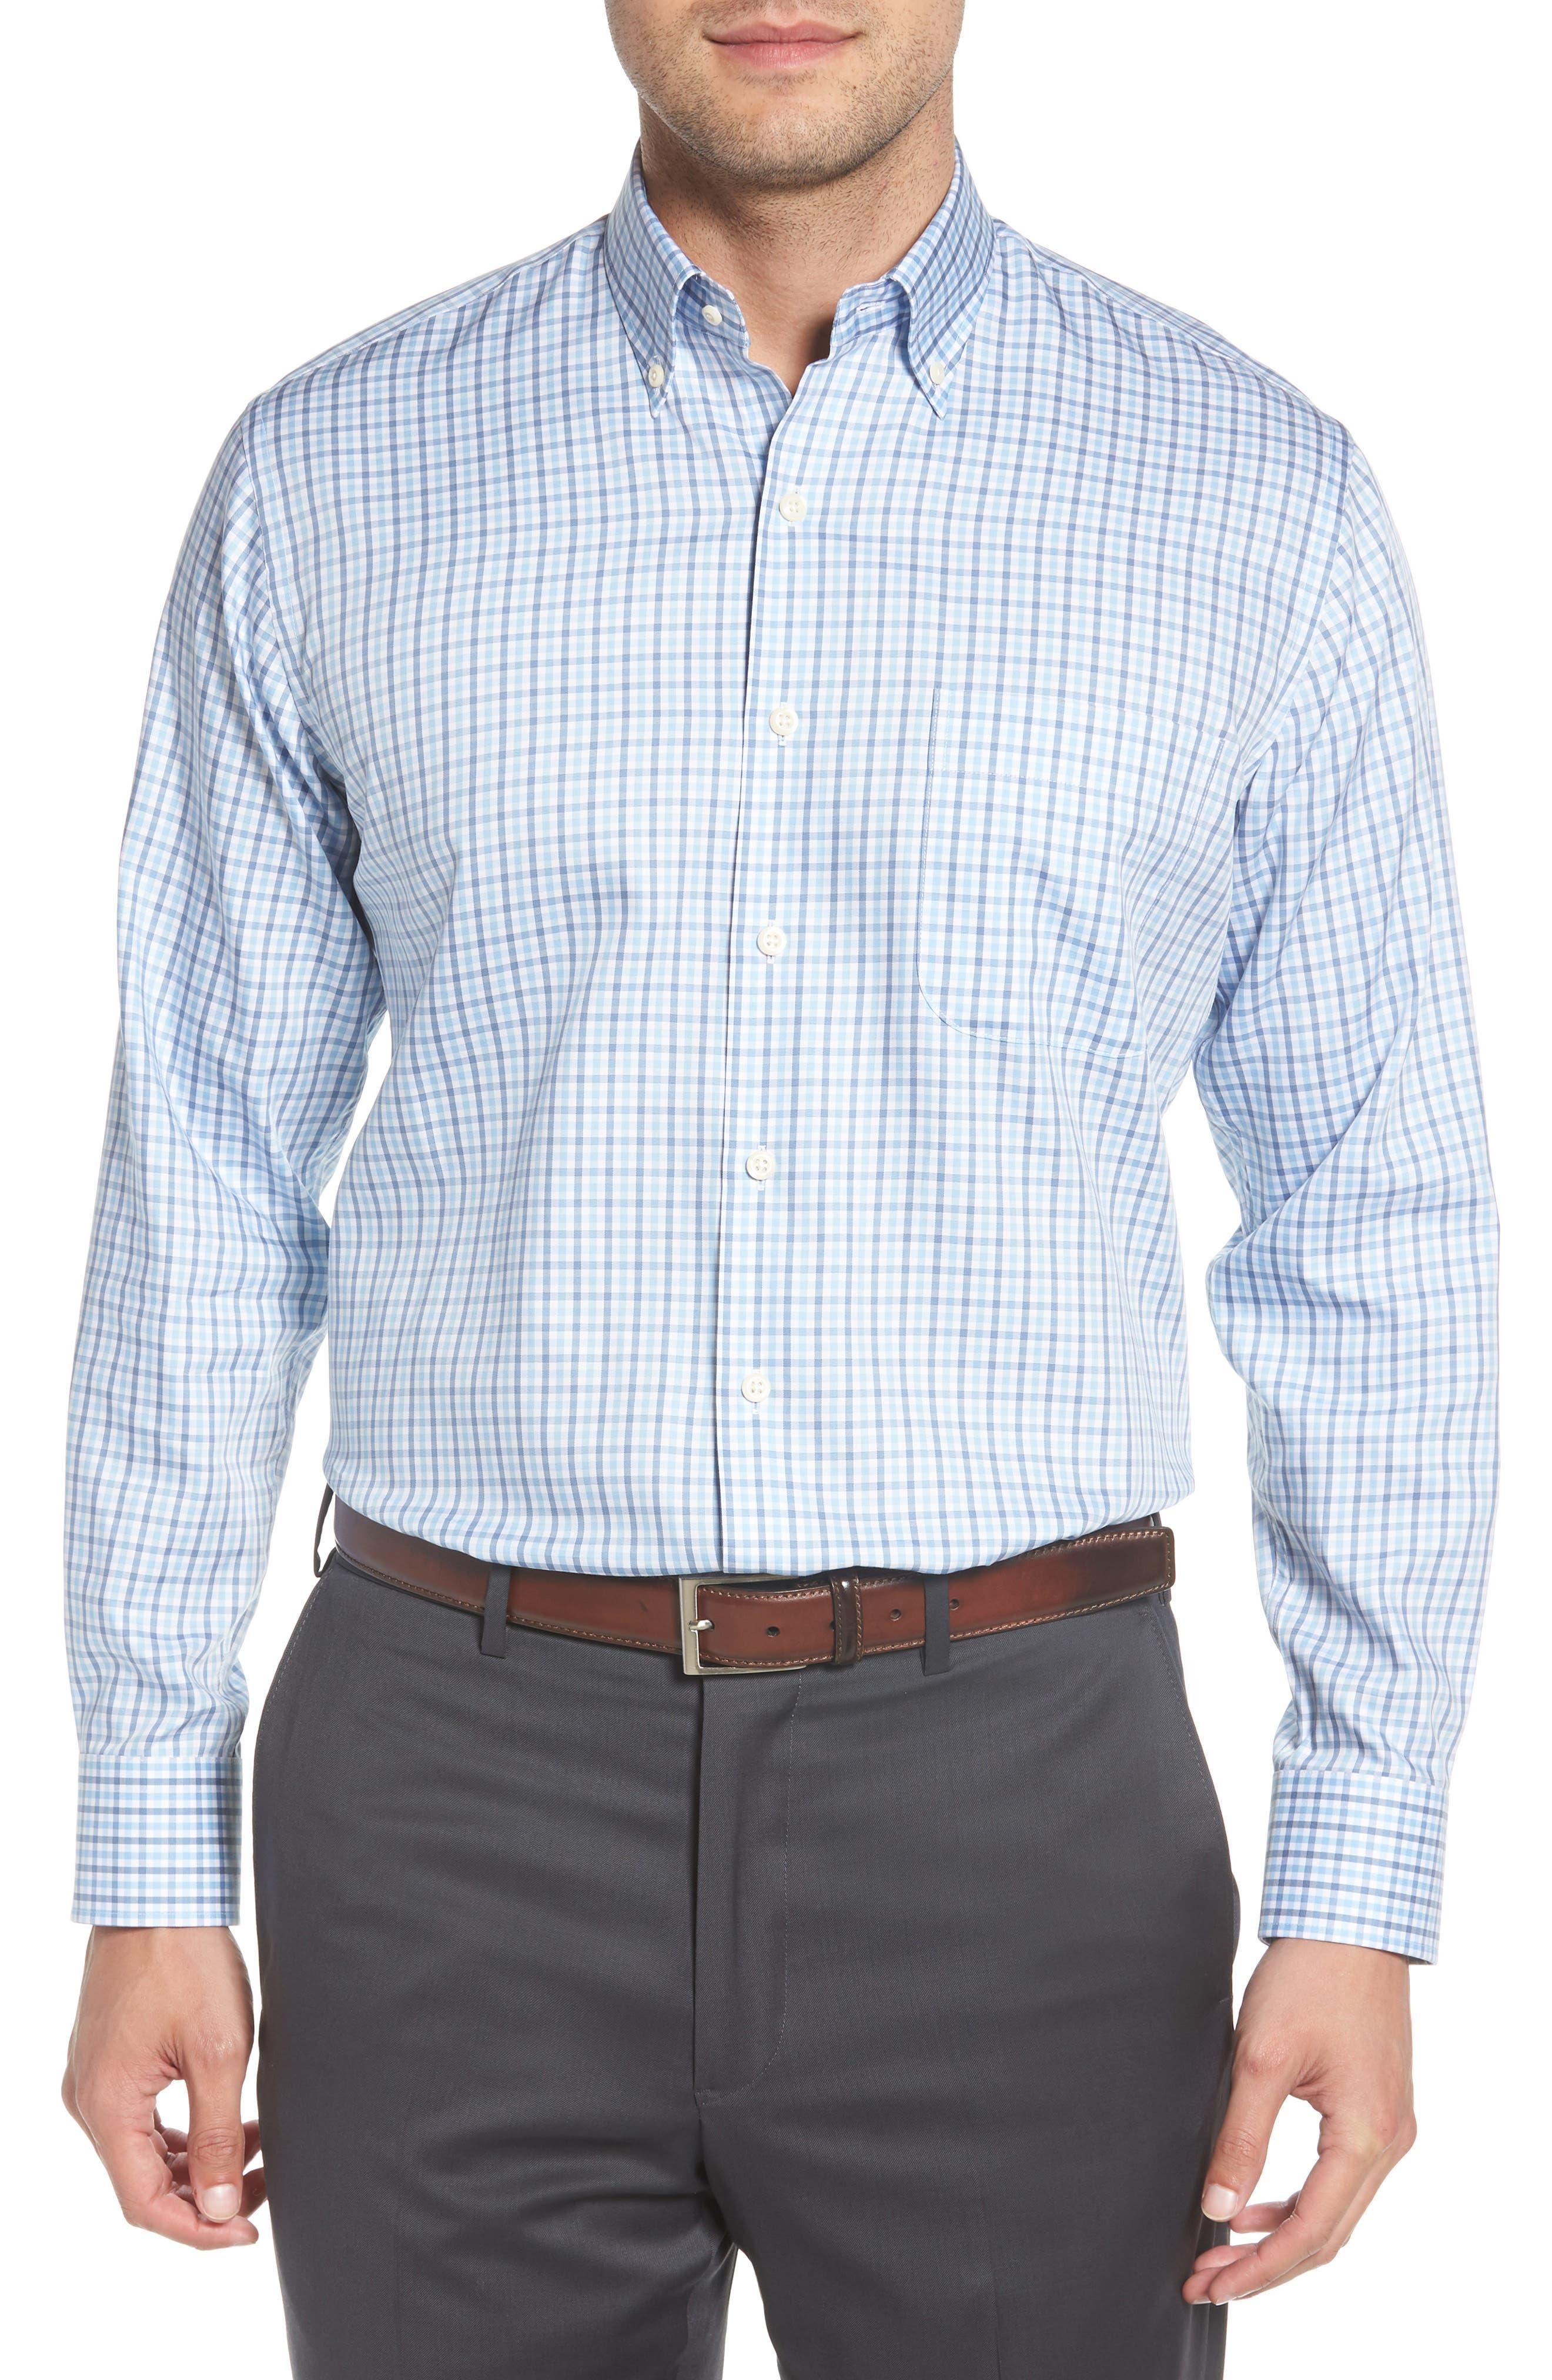 Lake City Regular Fit Tattersall Sport Shirt,                             Main thumbnail 1, color,                             COTTAGE BLUE